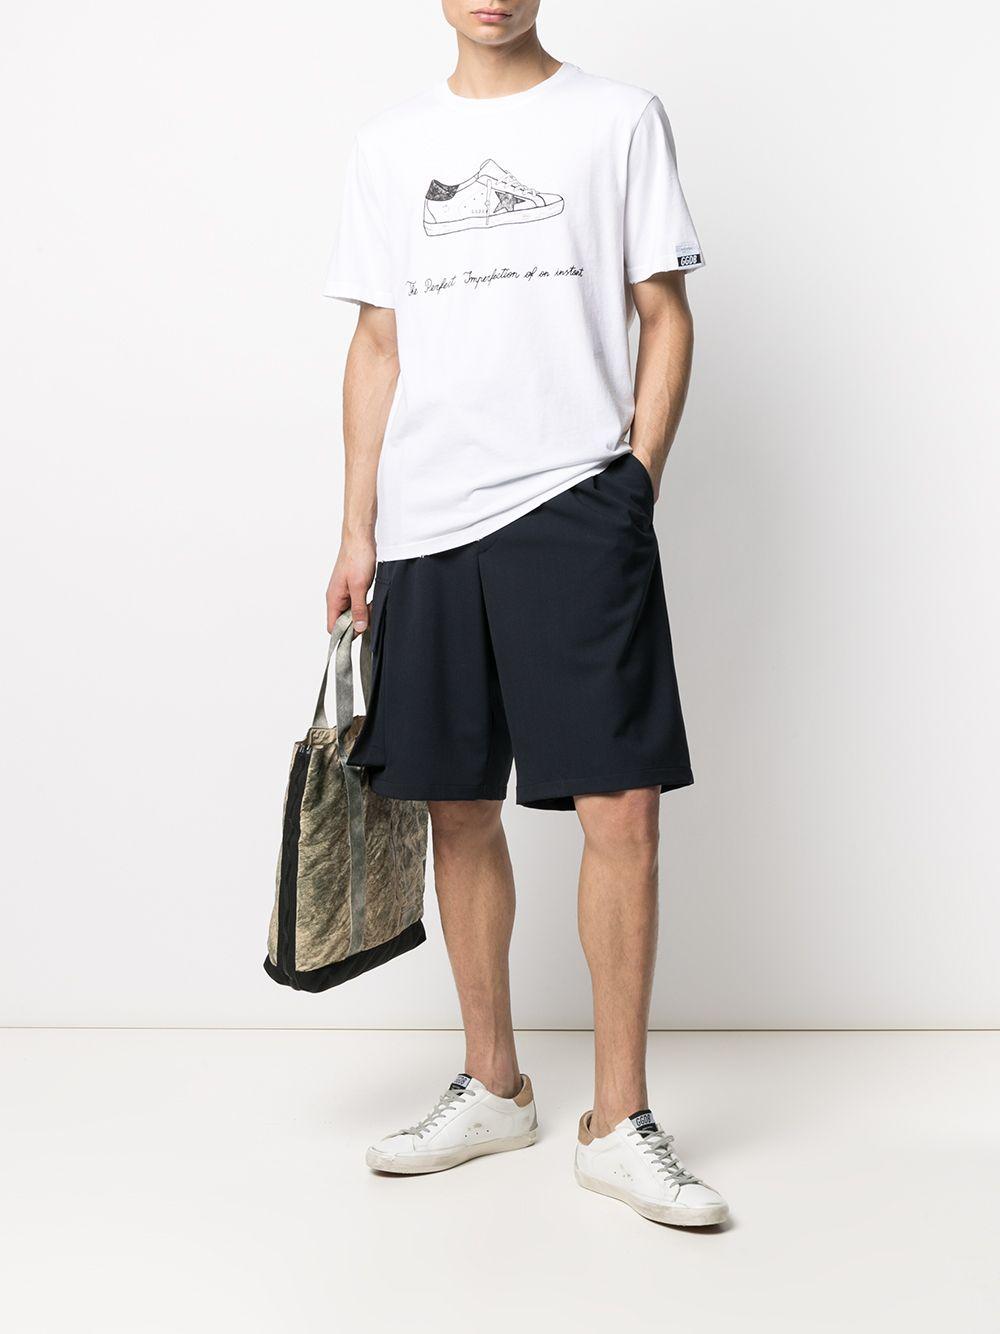 Picture of Golden Goose Deluxe Brand | Sneaker-Print T-Shirt